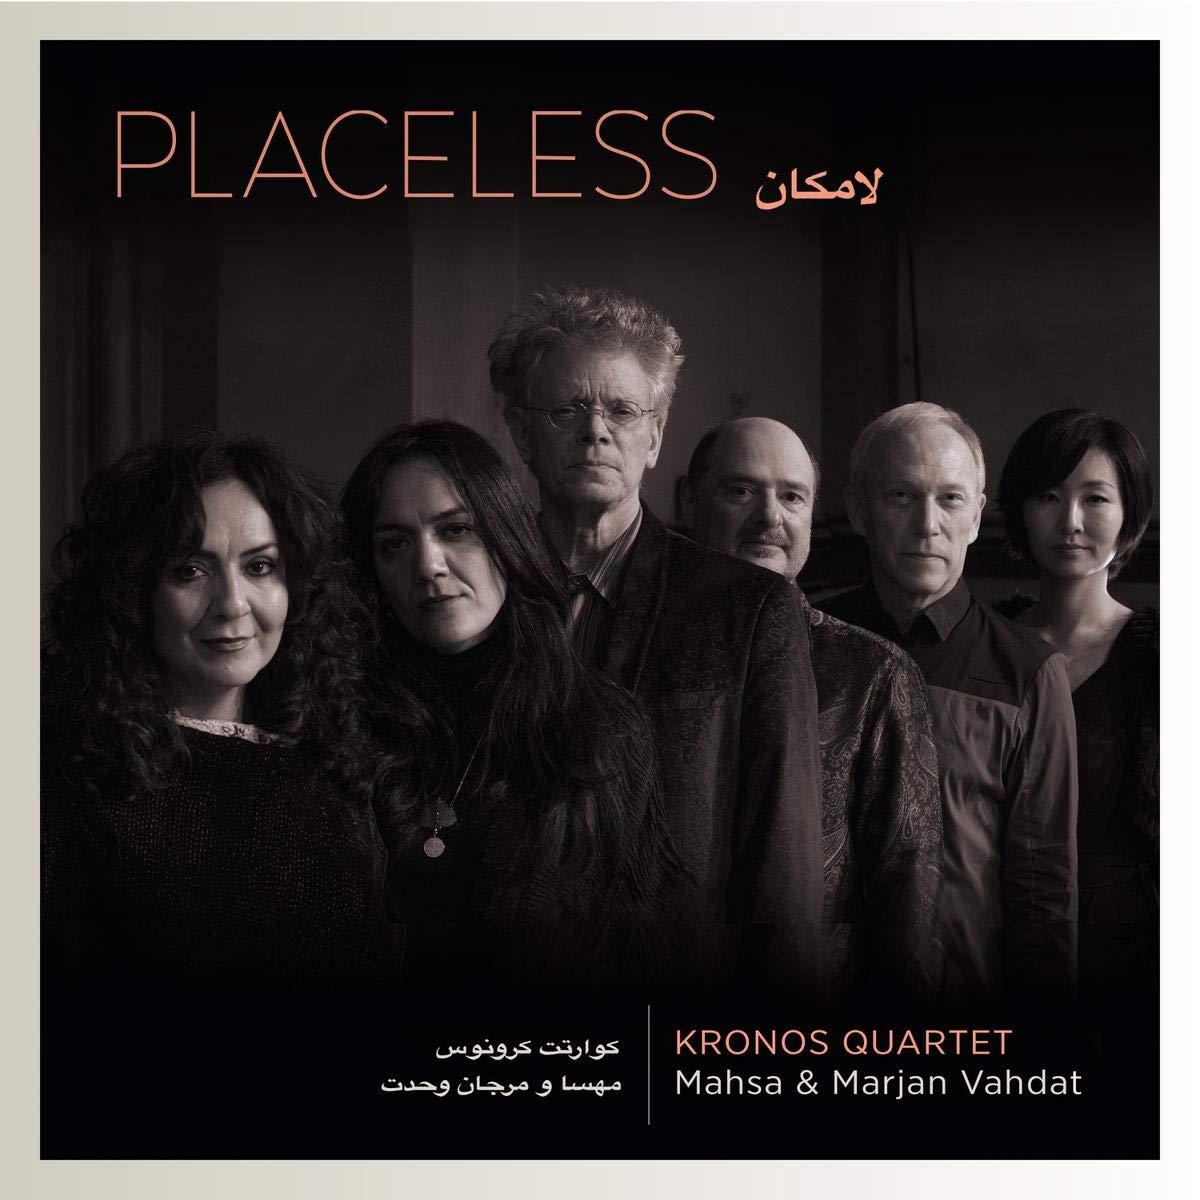 KRONOS QUARTET - Kronos Quartet With Mahsa & Marjan Vahdat : Placeless cover